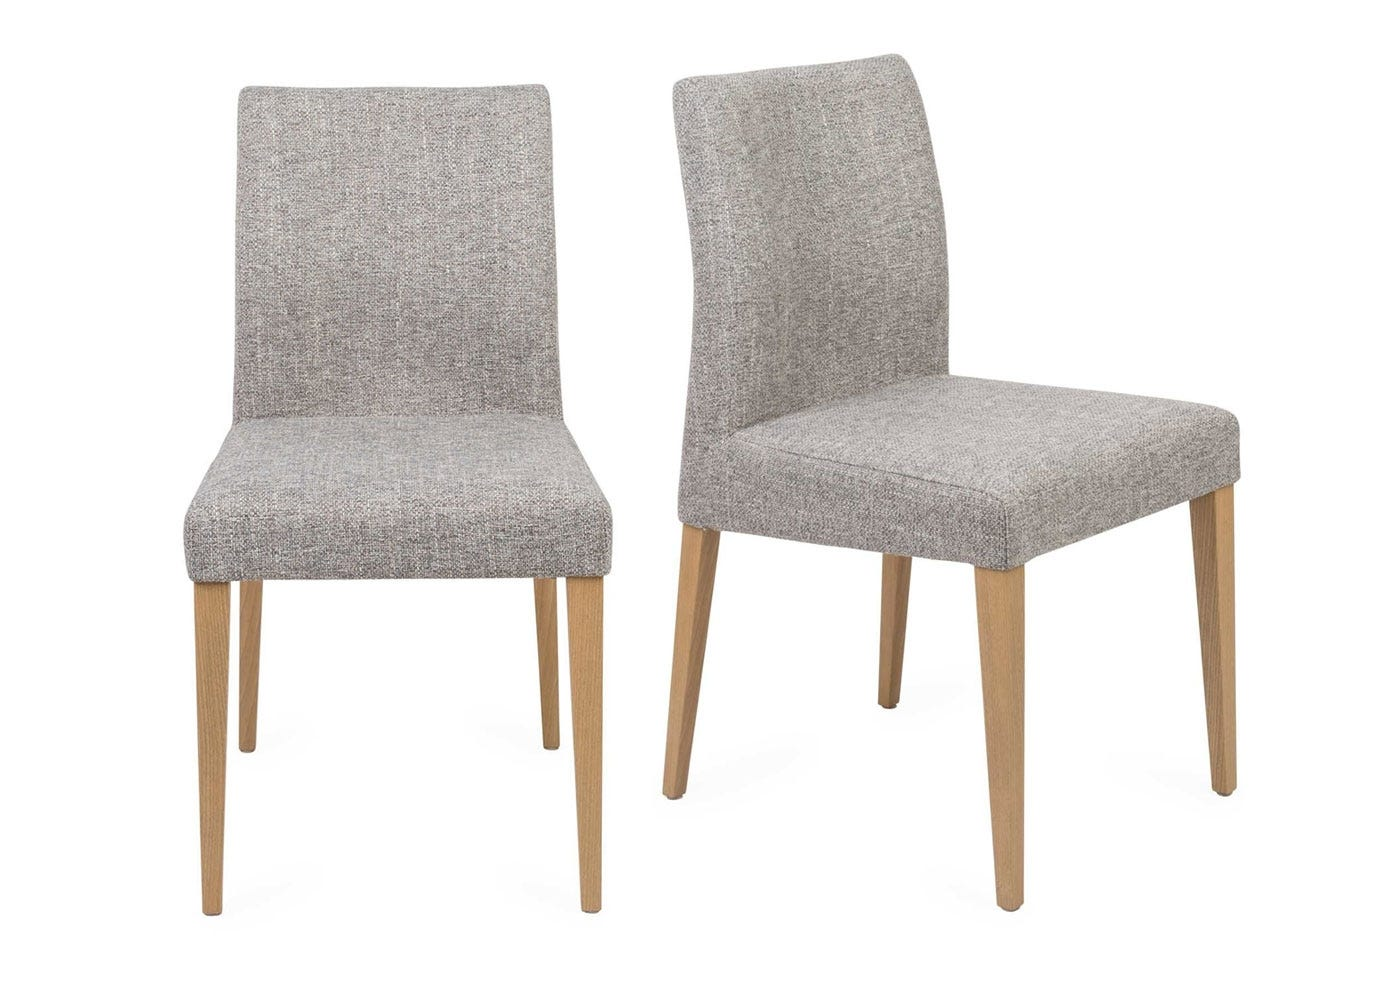 Hudson Pair of Dining Chairs Volcano Zinc Beech Natural Legs